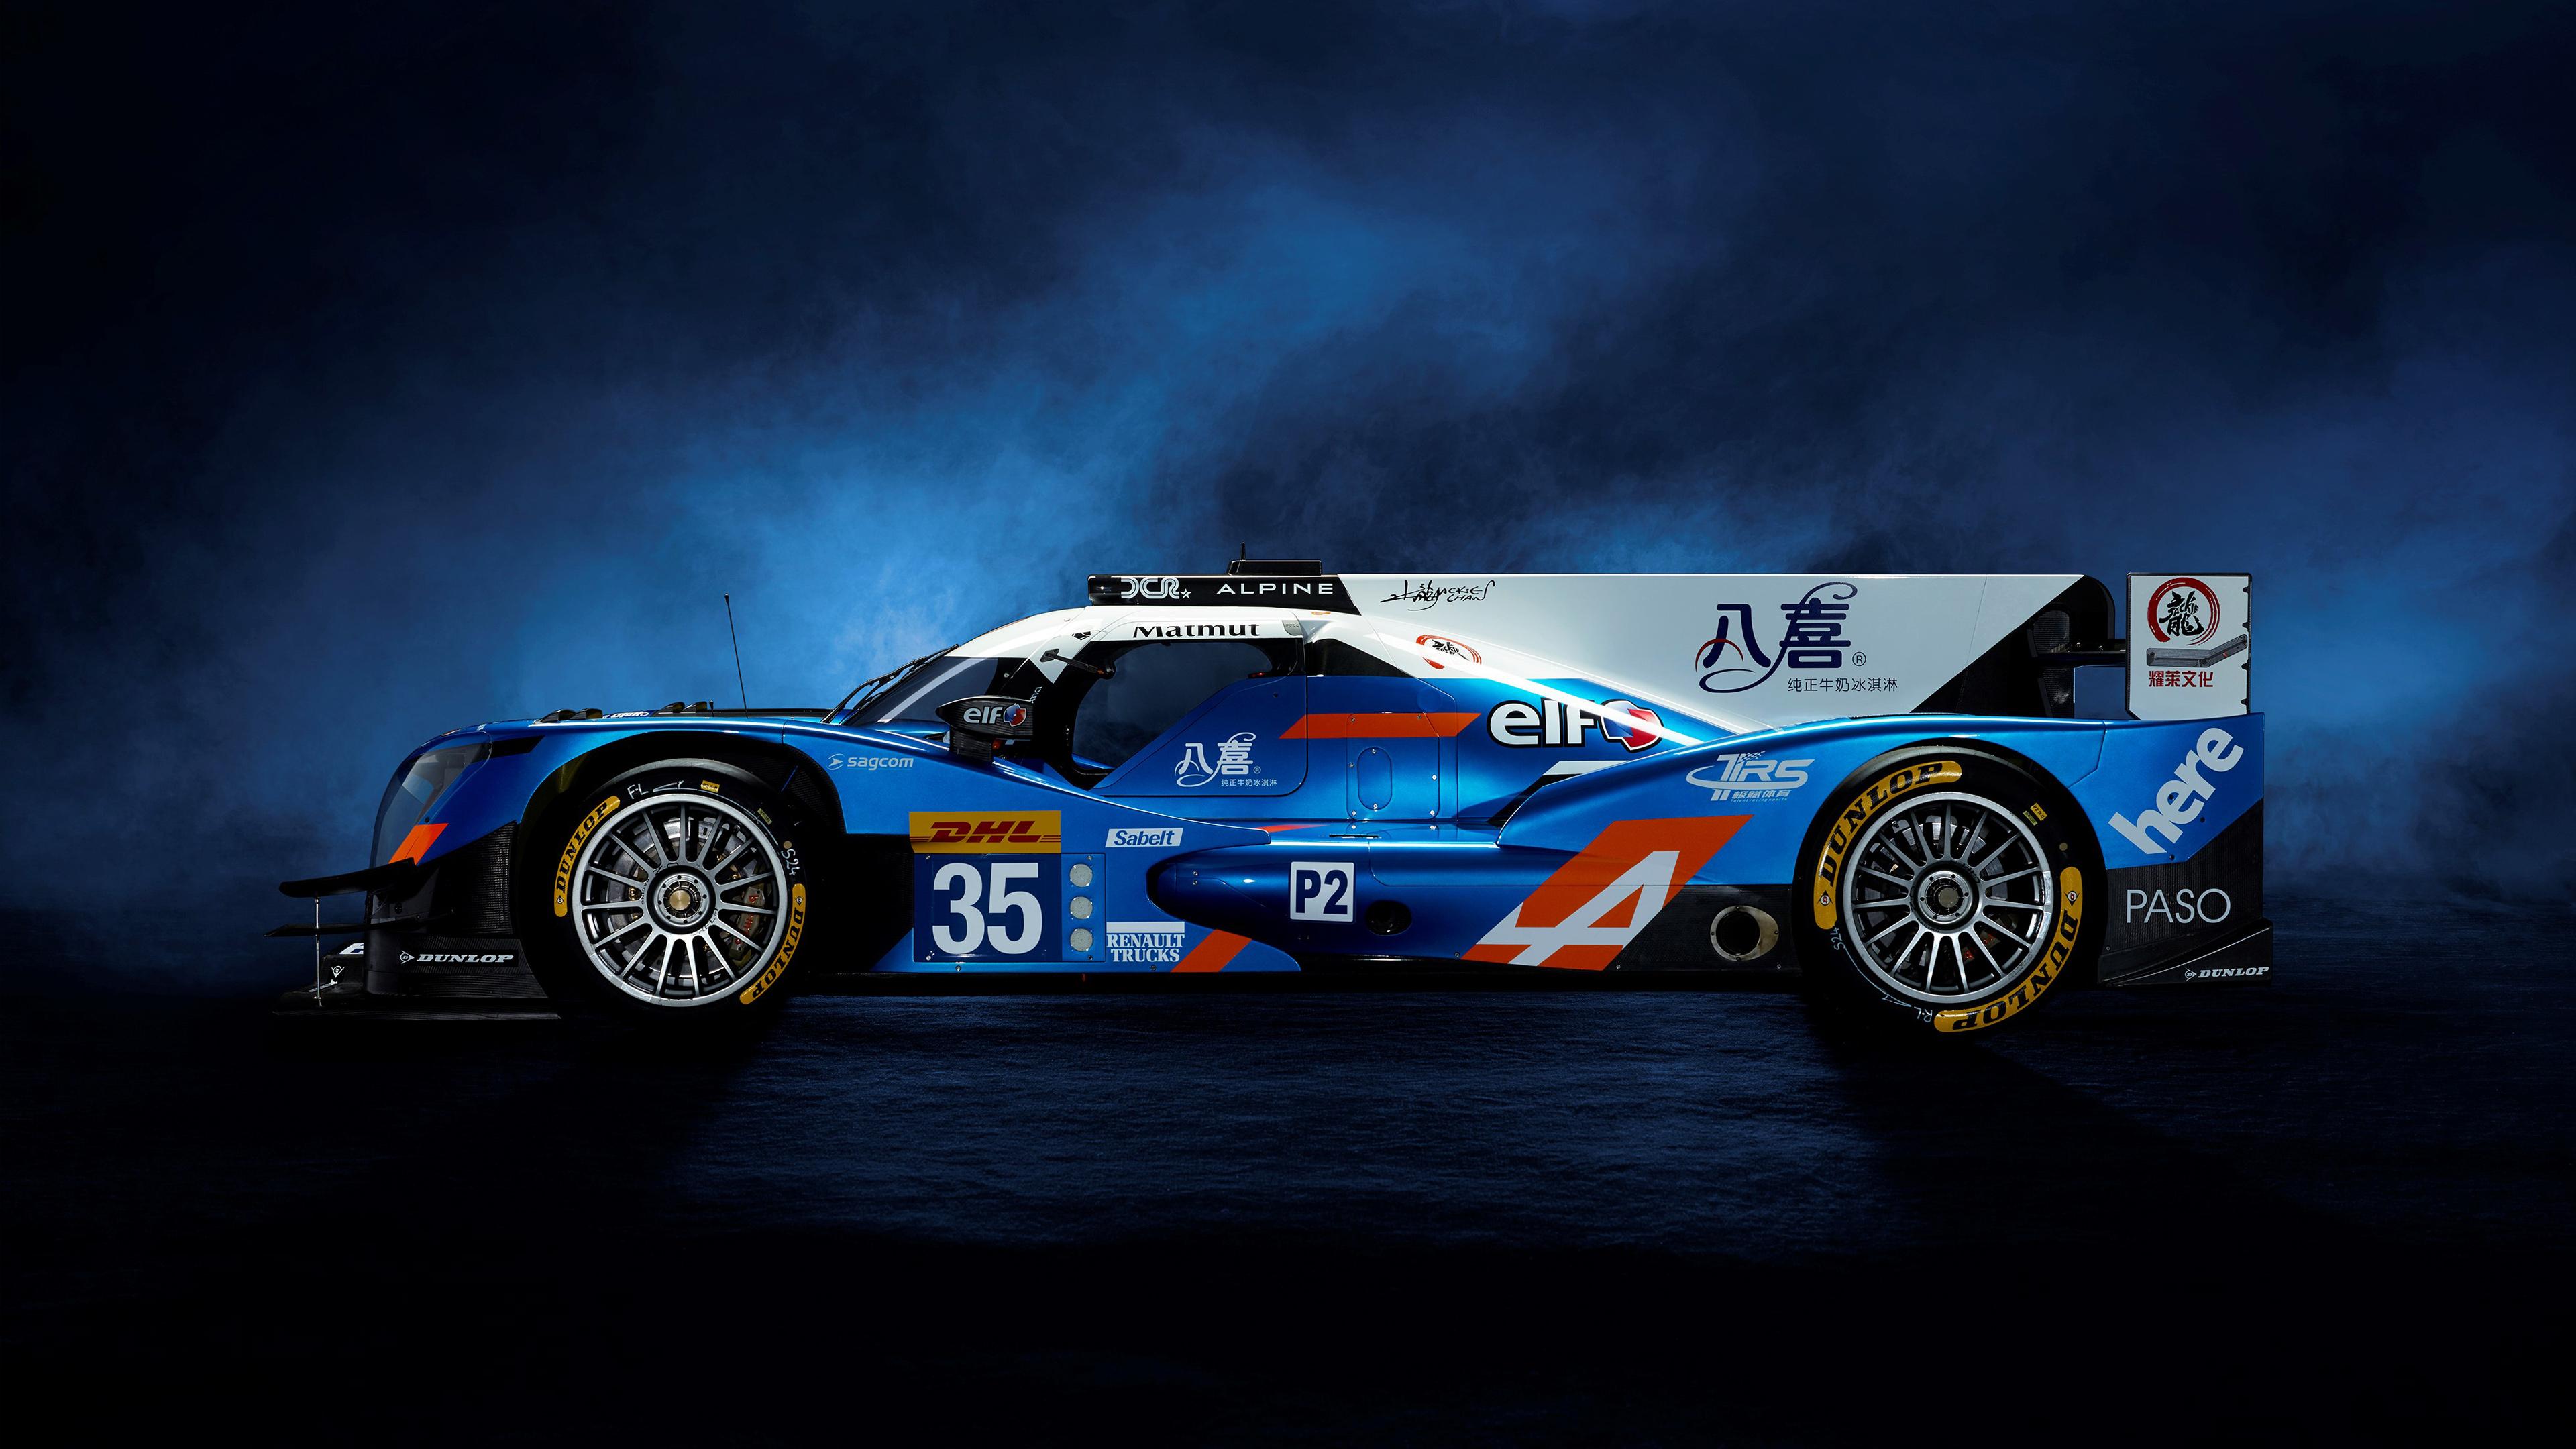 Alpine A460 Race Car 4k Wallpaper Hd Car Wallpapers Id 7230